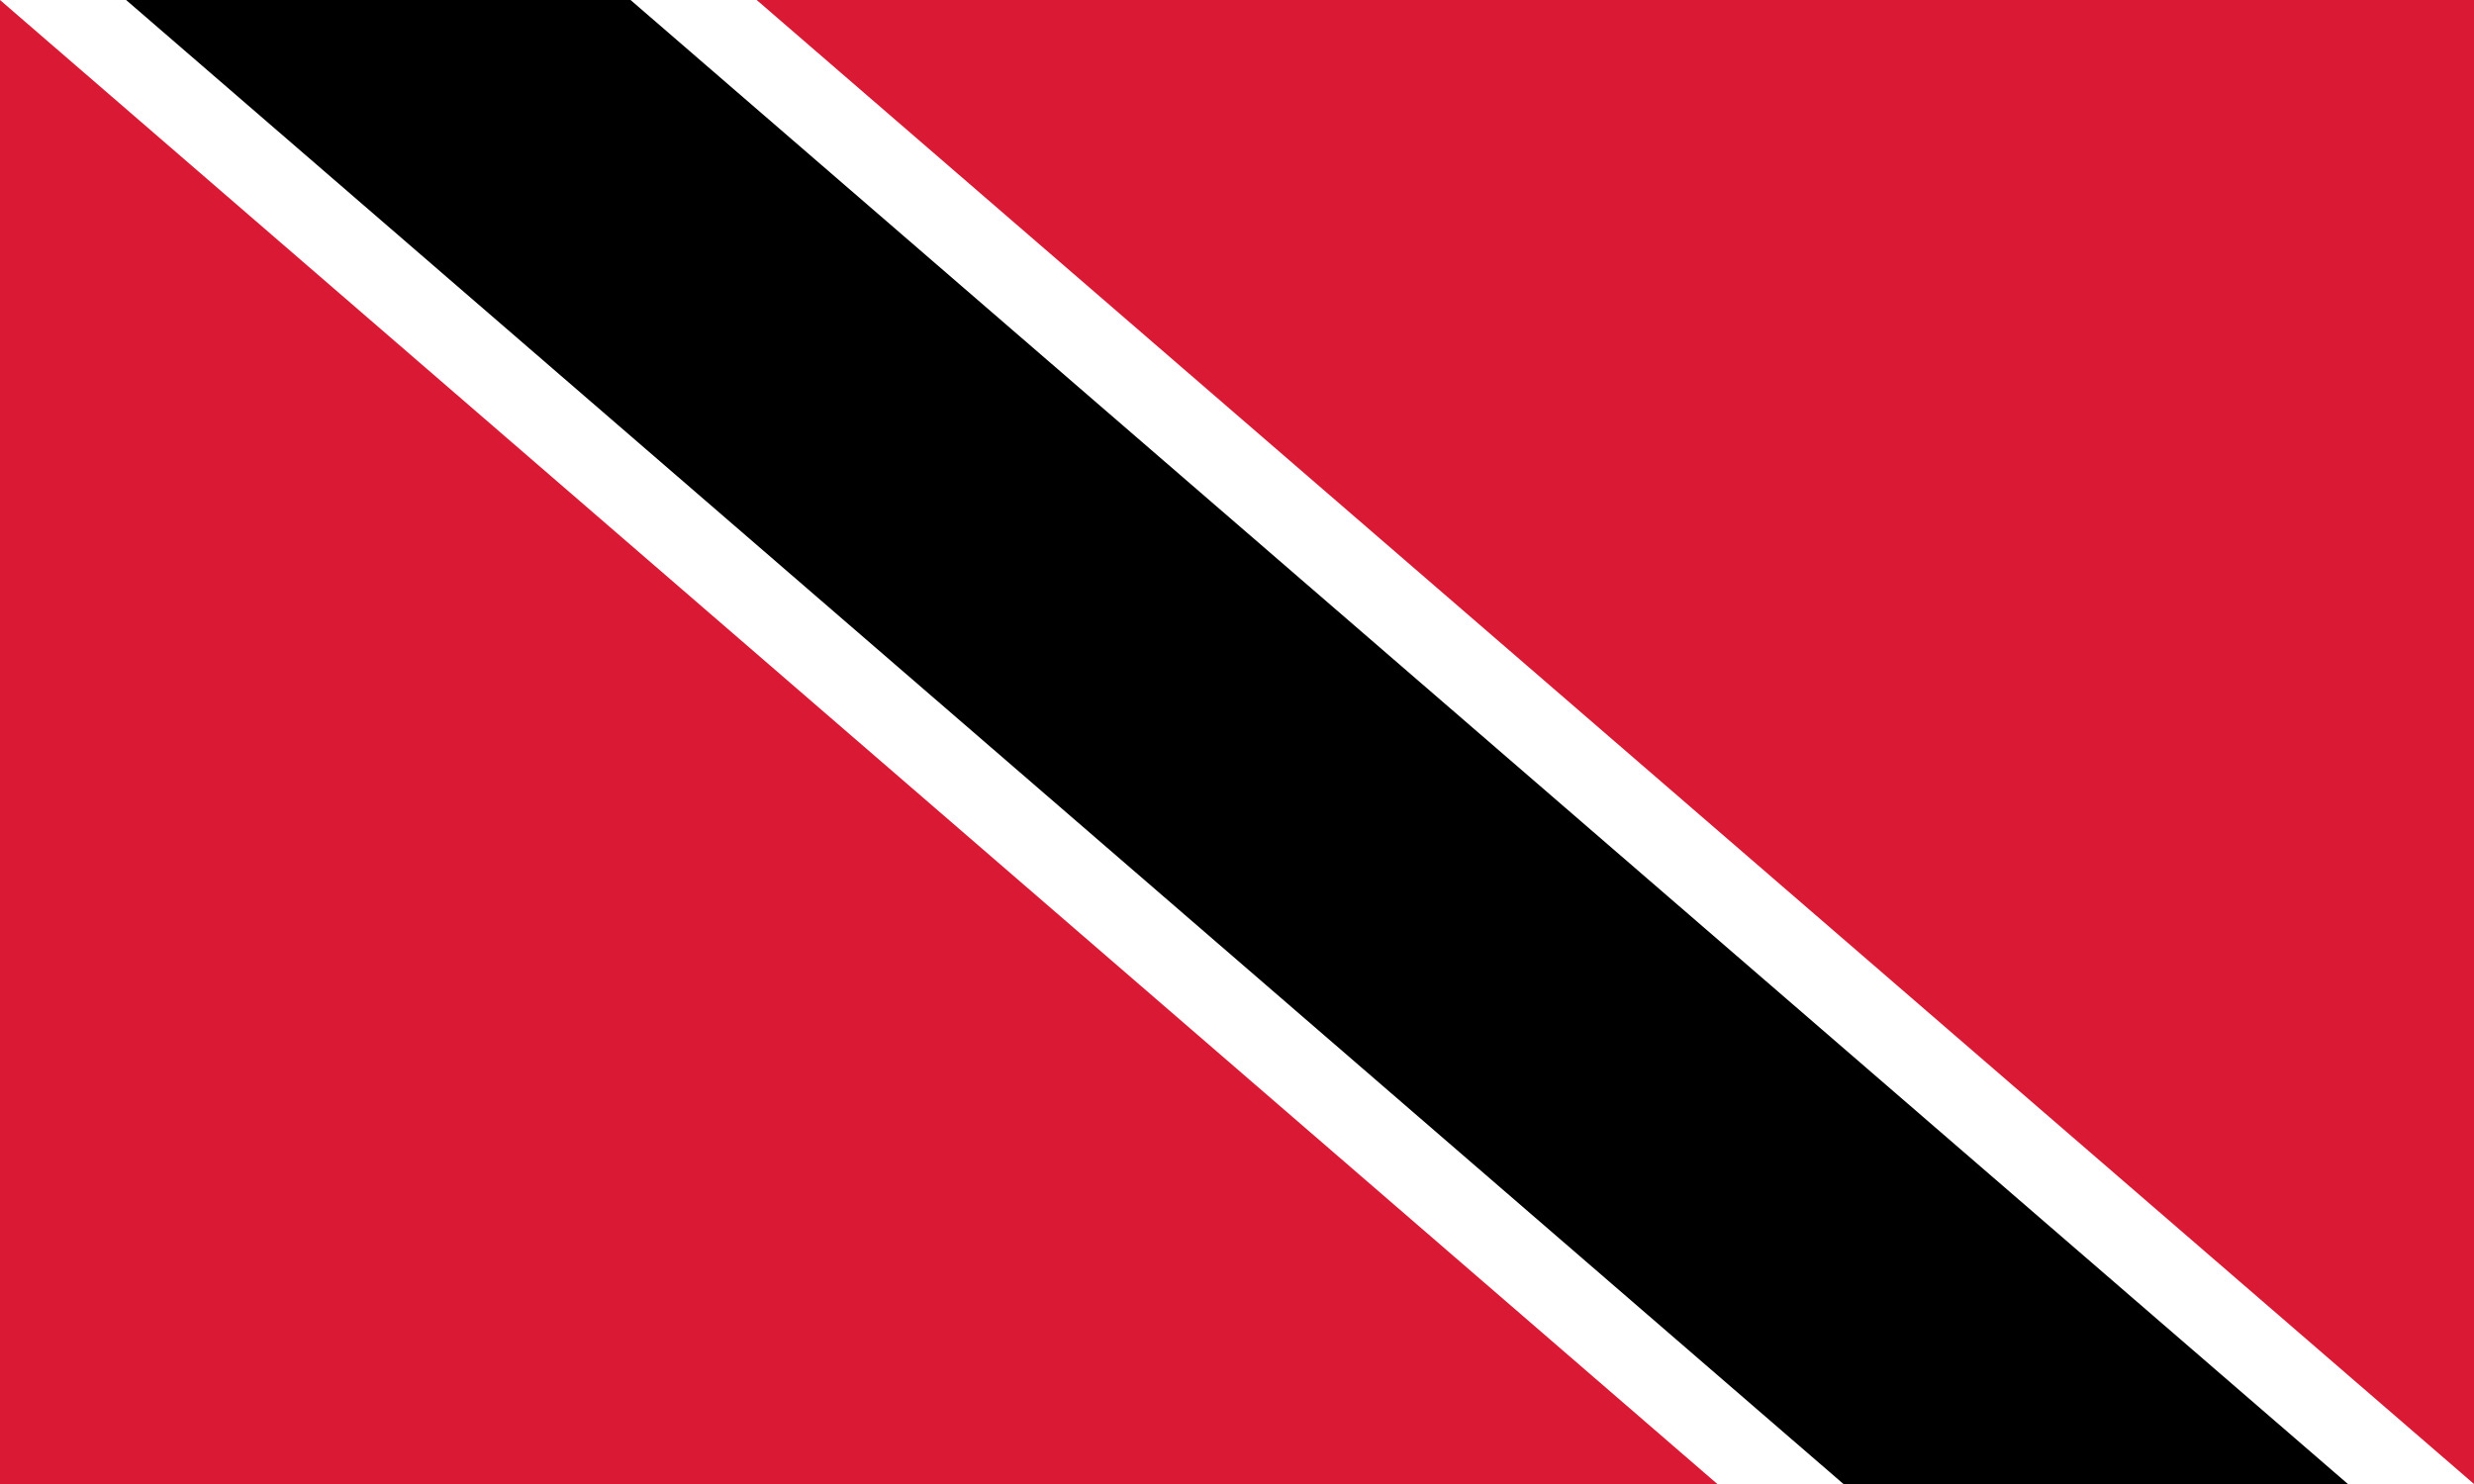 Trinidad_and_Tobago Flag Colours